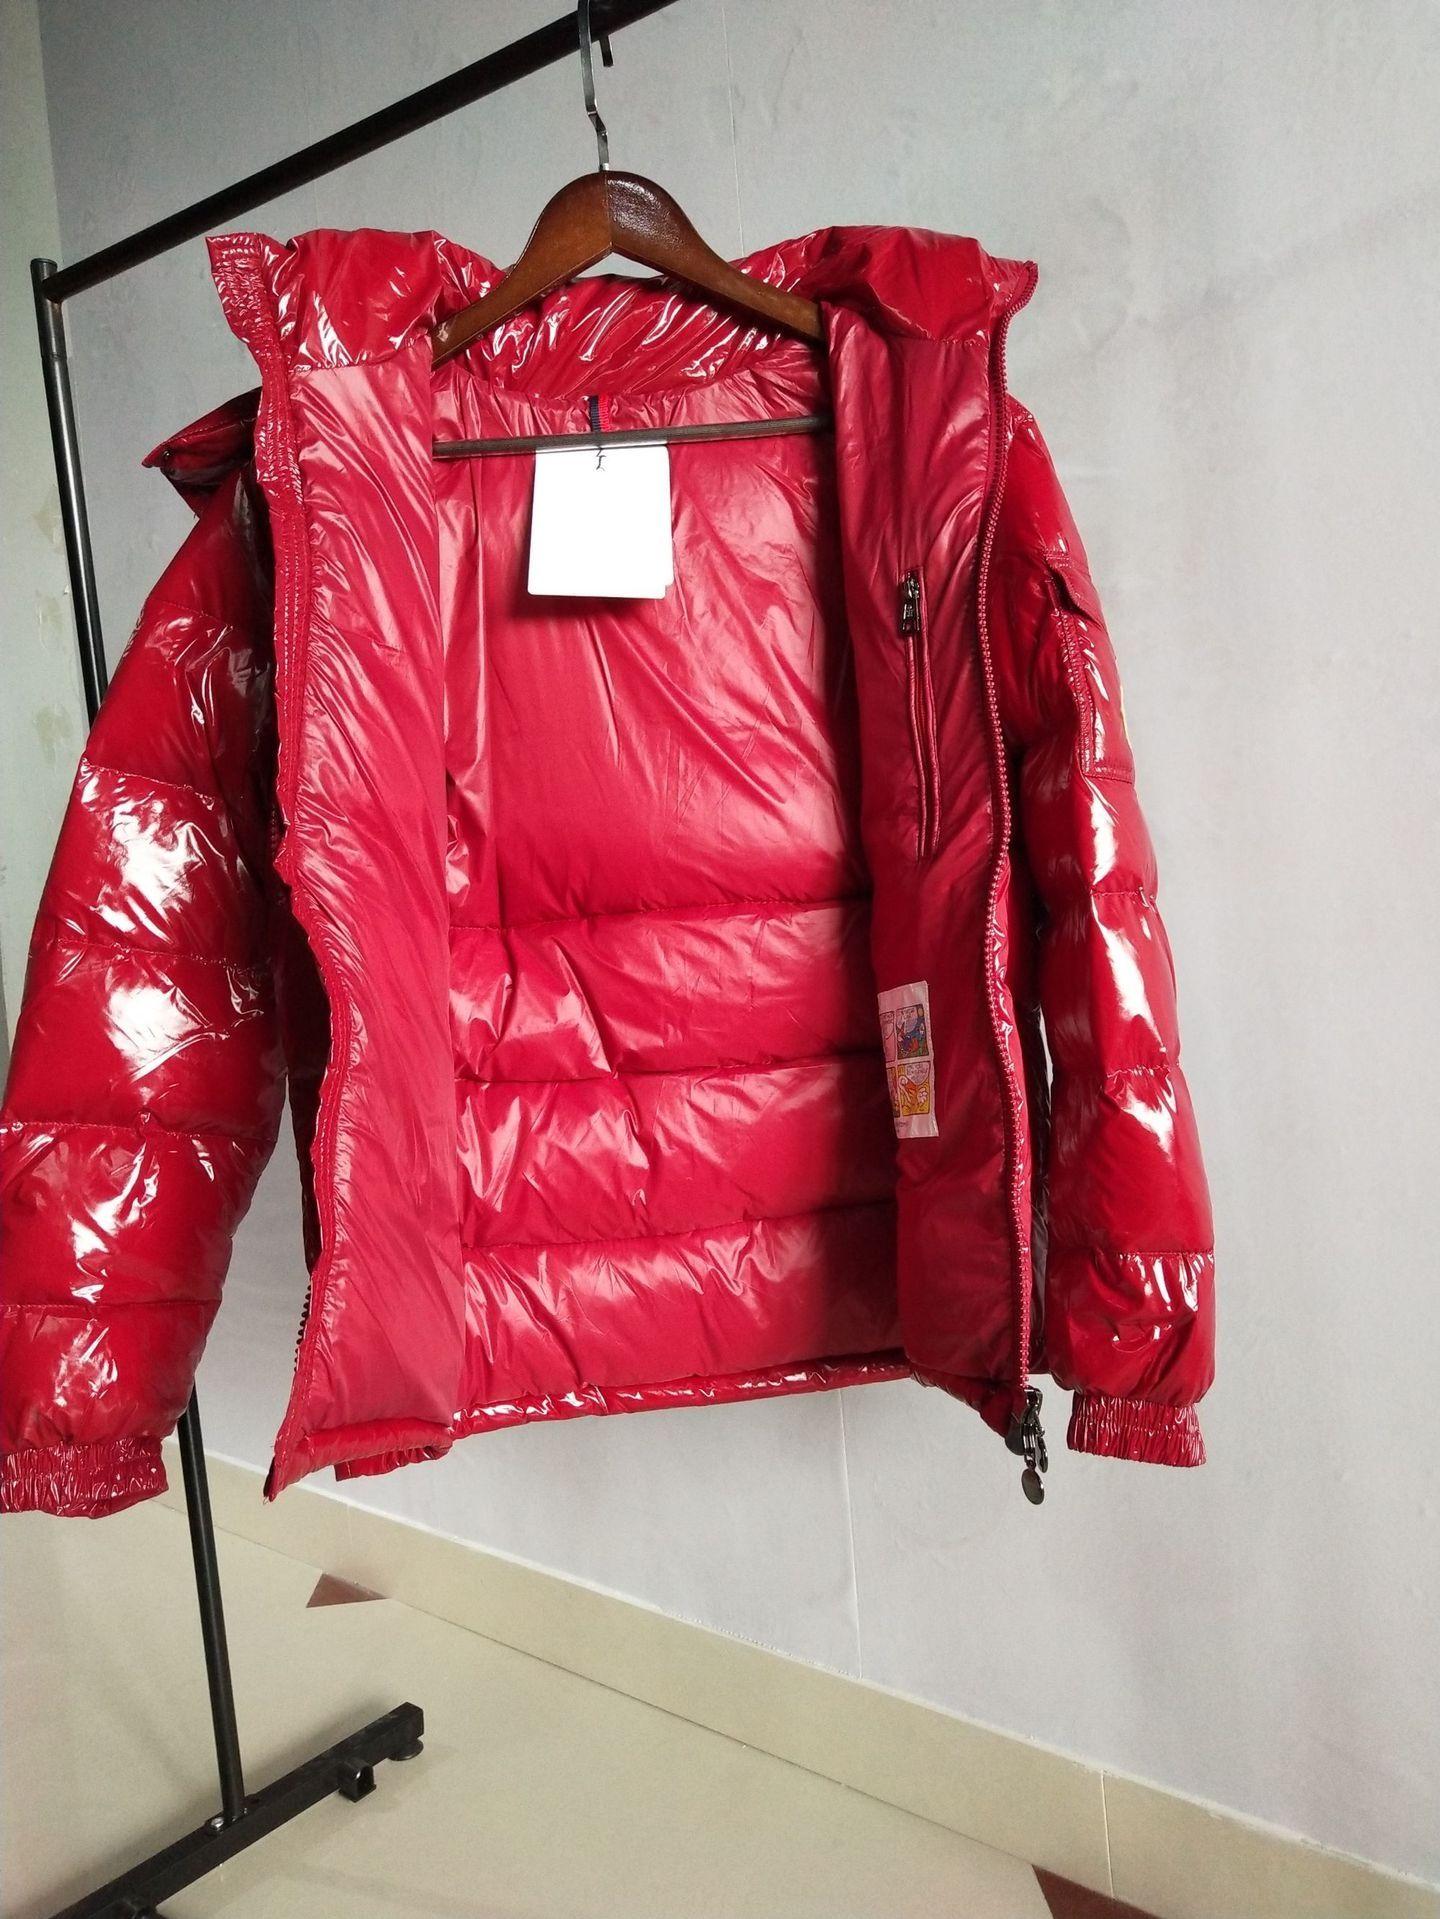 KSeQ Fit jacket men women rosejackets Floral Bomber Jacket Men Hip Hop Slim windbreaker Flowers Pilot Bomber Coat